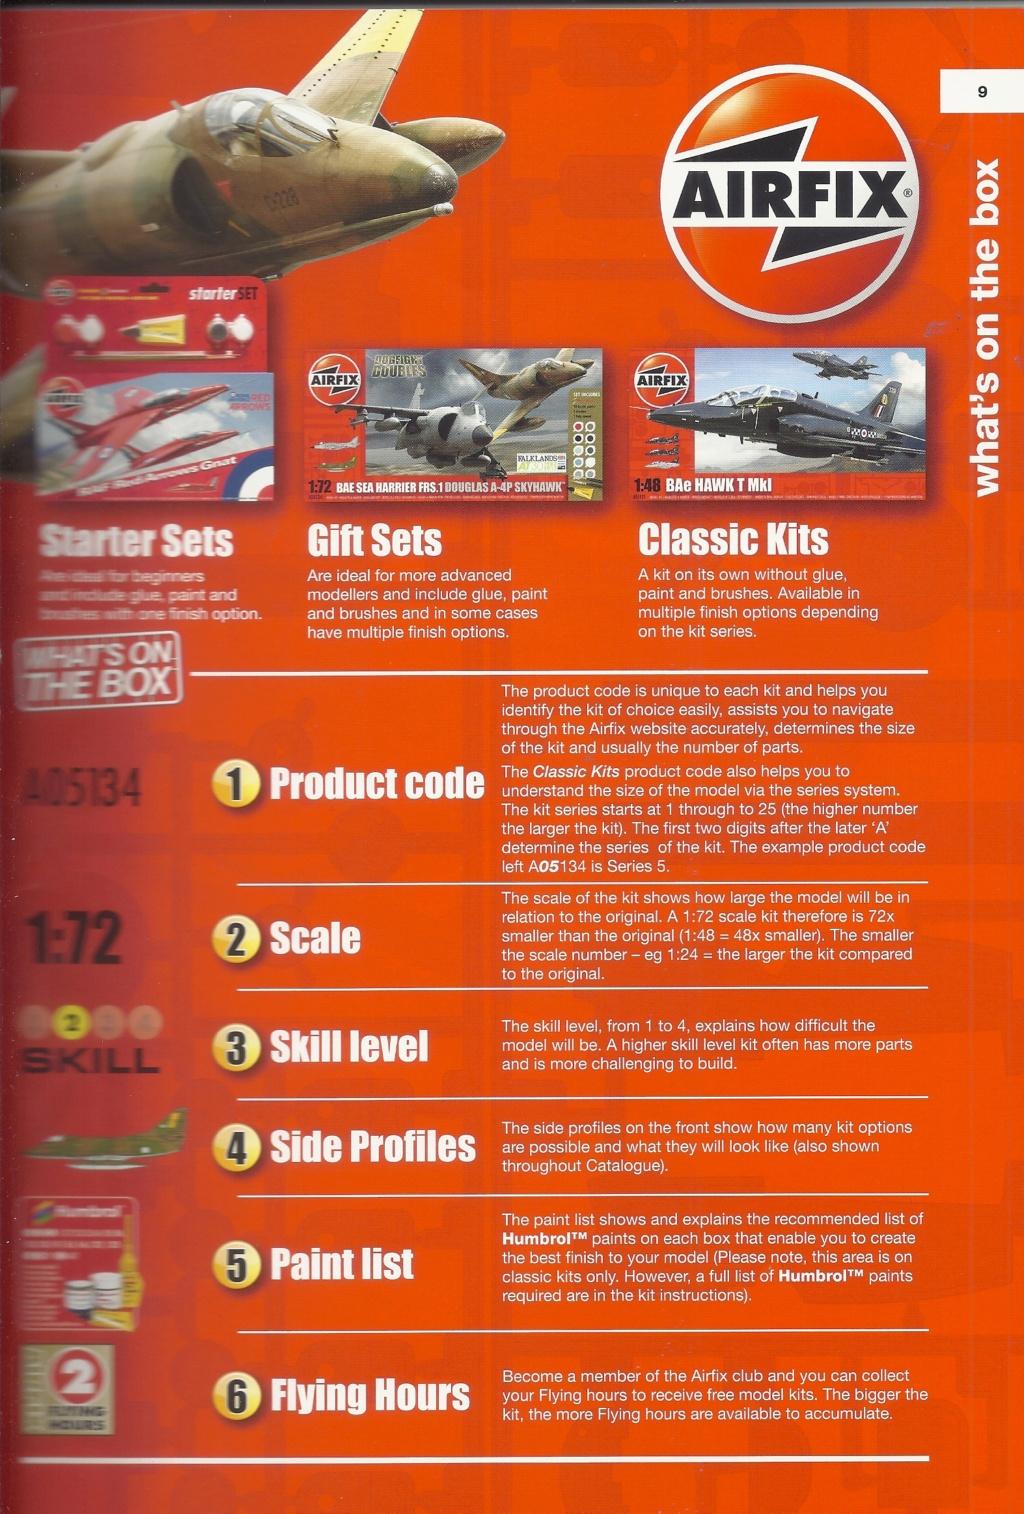 [AIRFIX 2013] Catalogue 2013 Airf1408